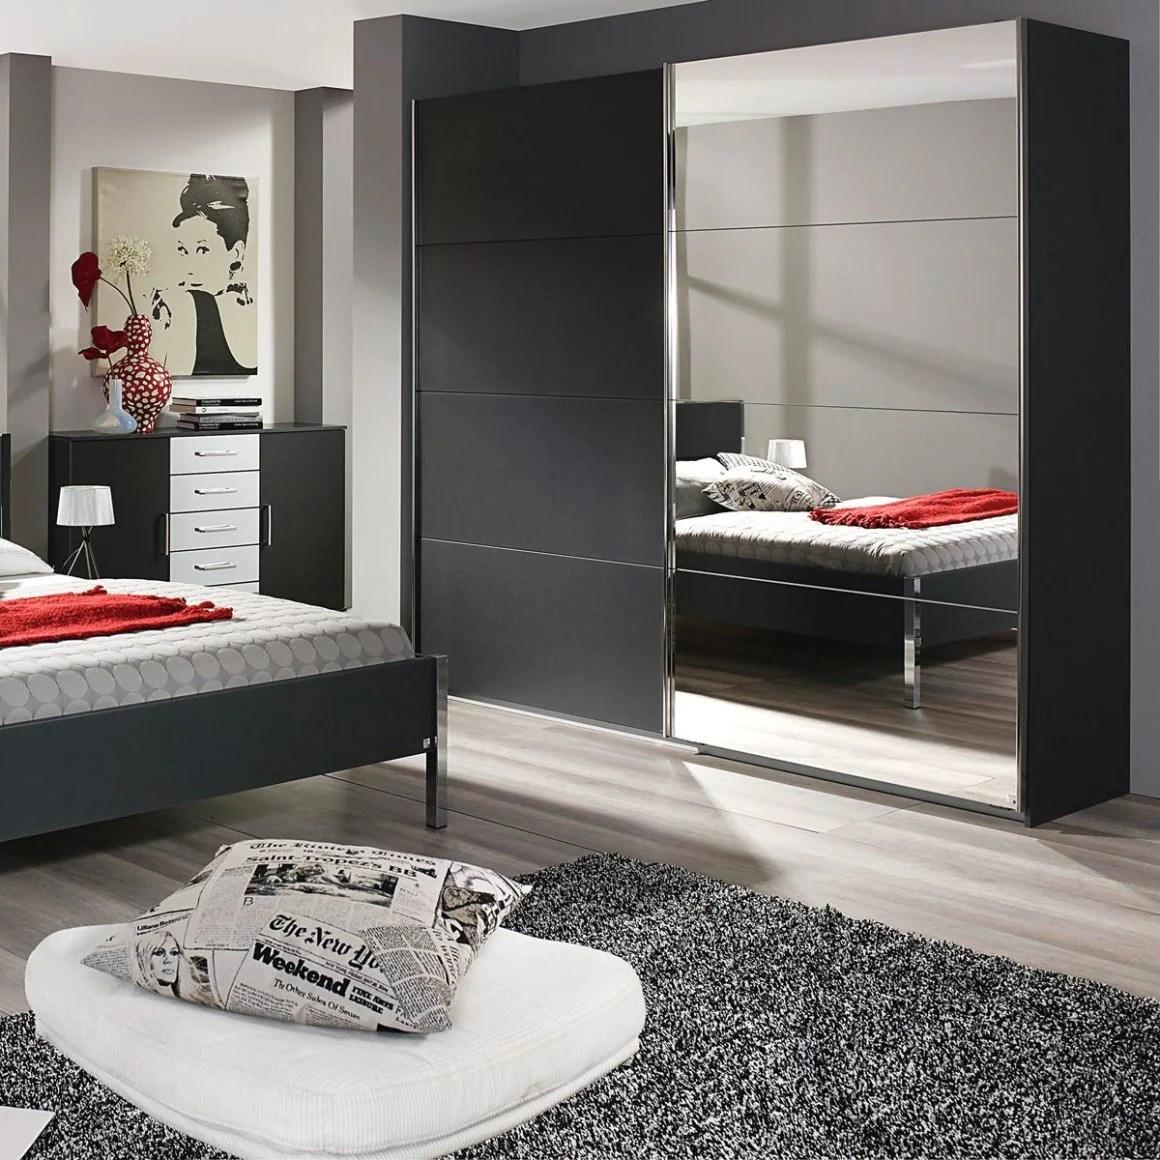 amenajare dormitor mic modern